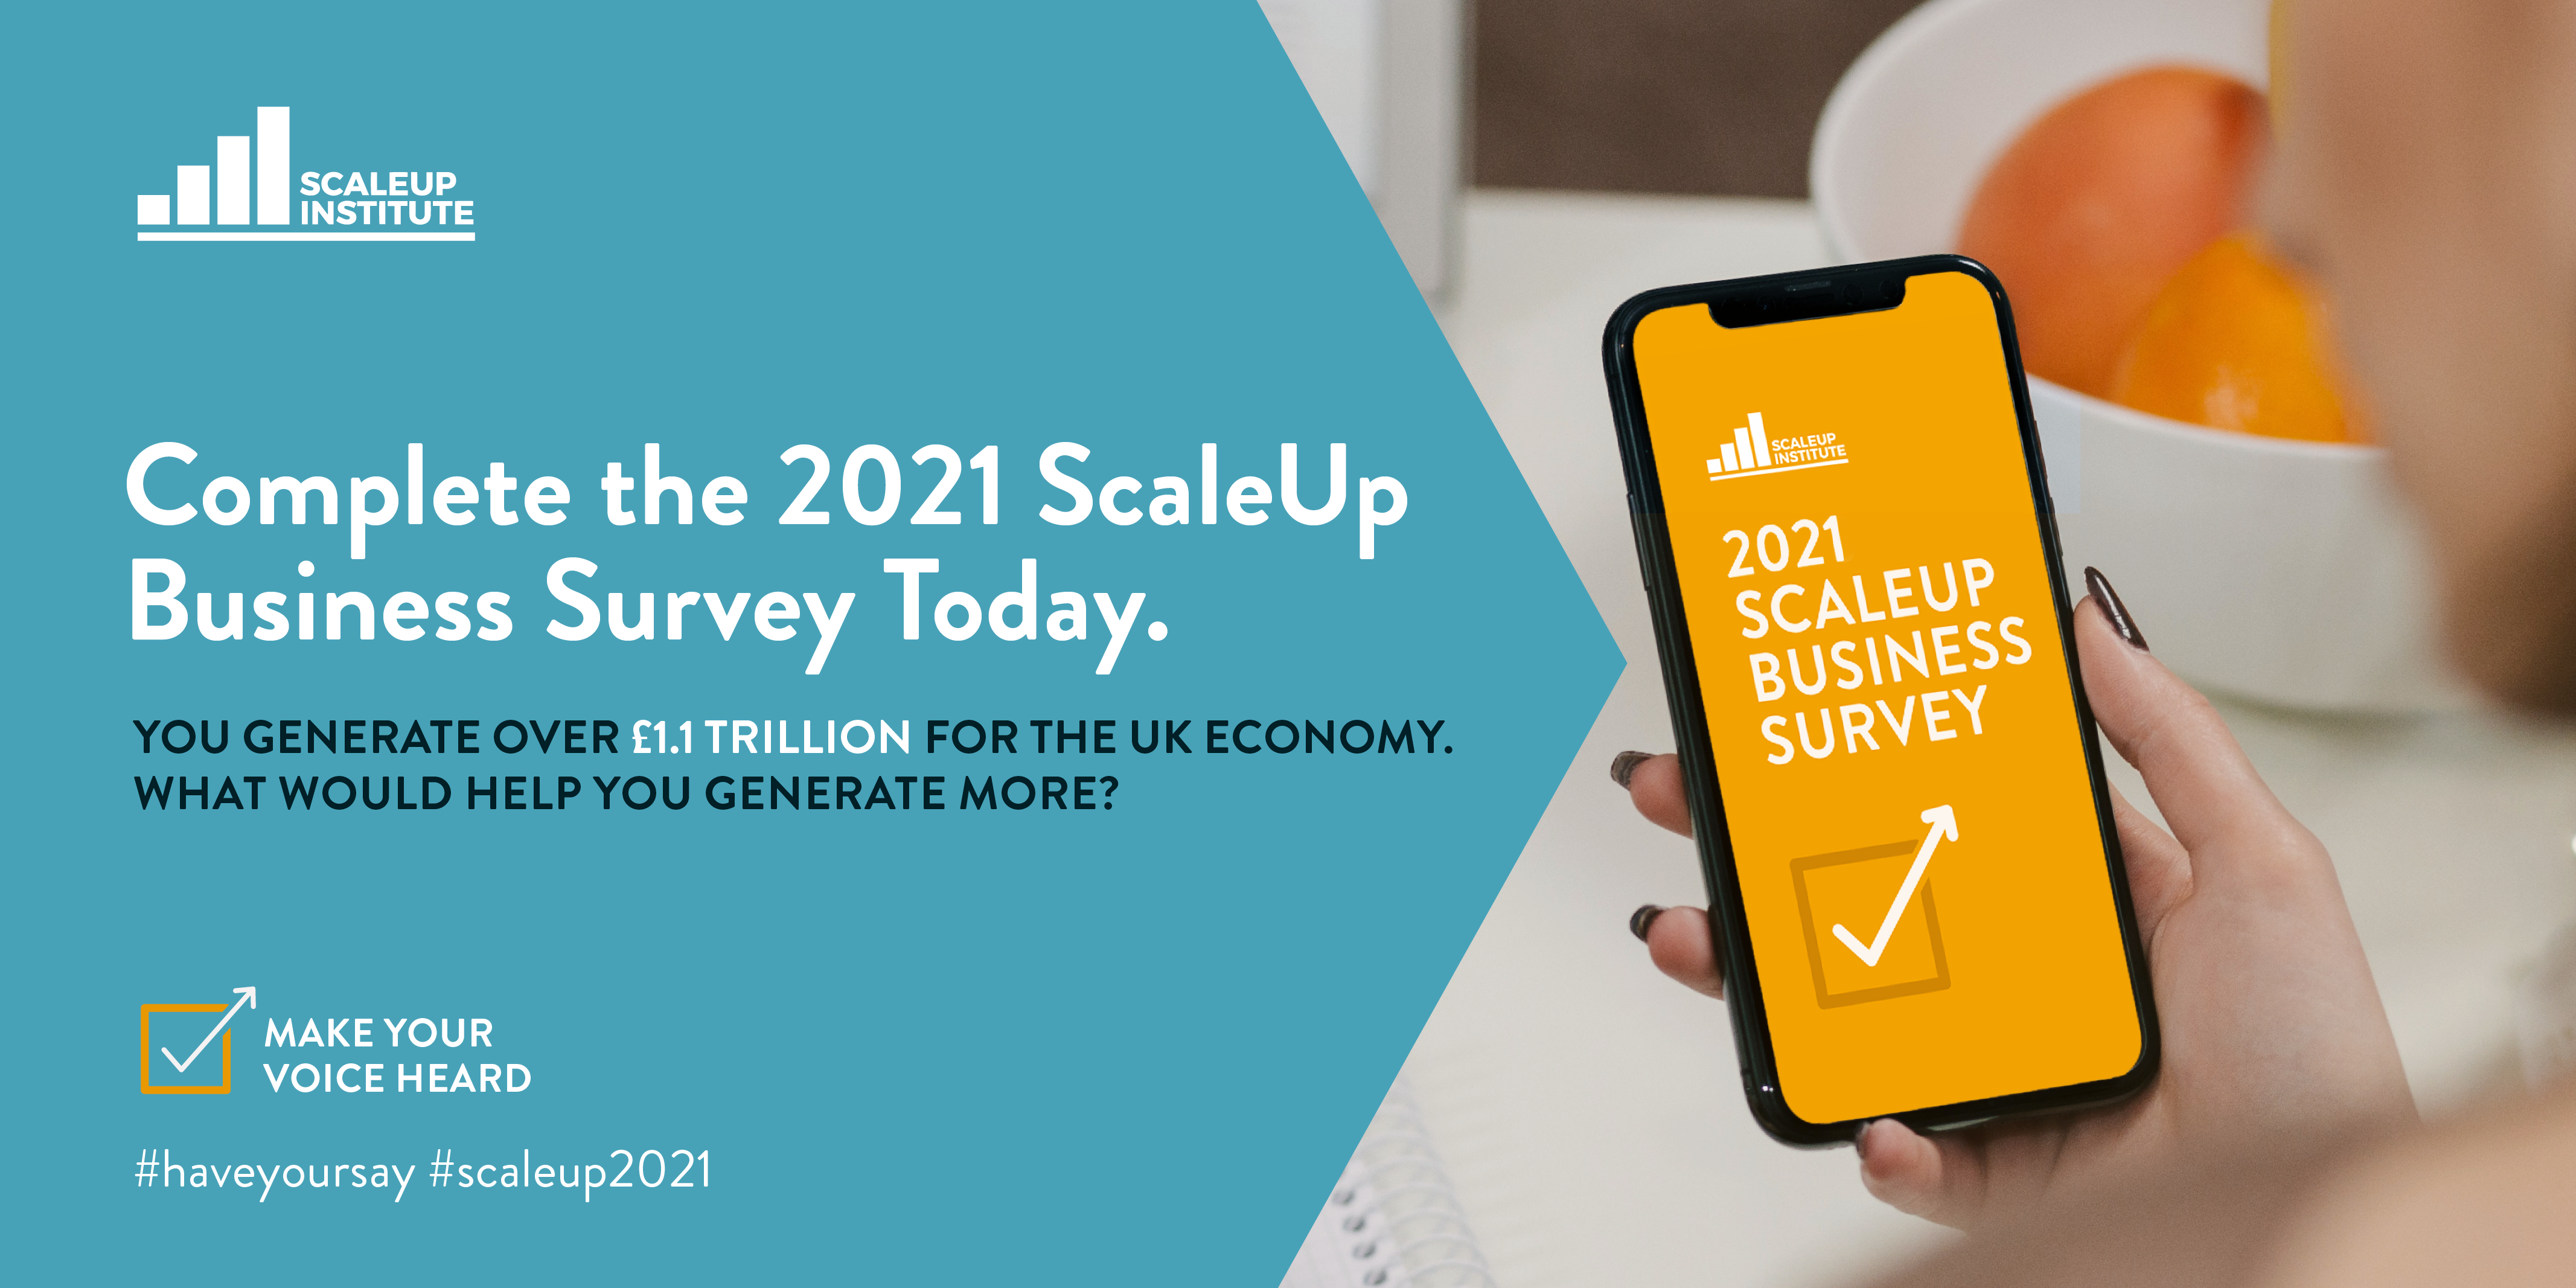 ScaleUp Survey